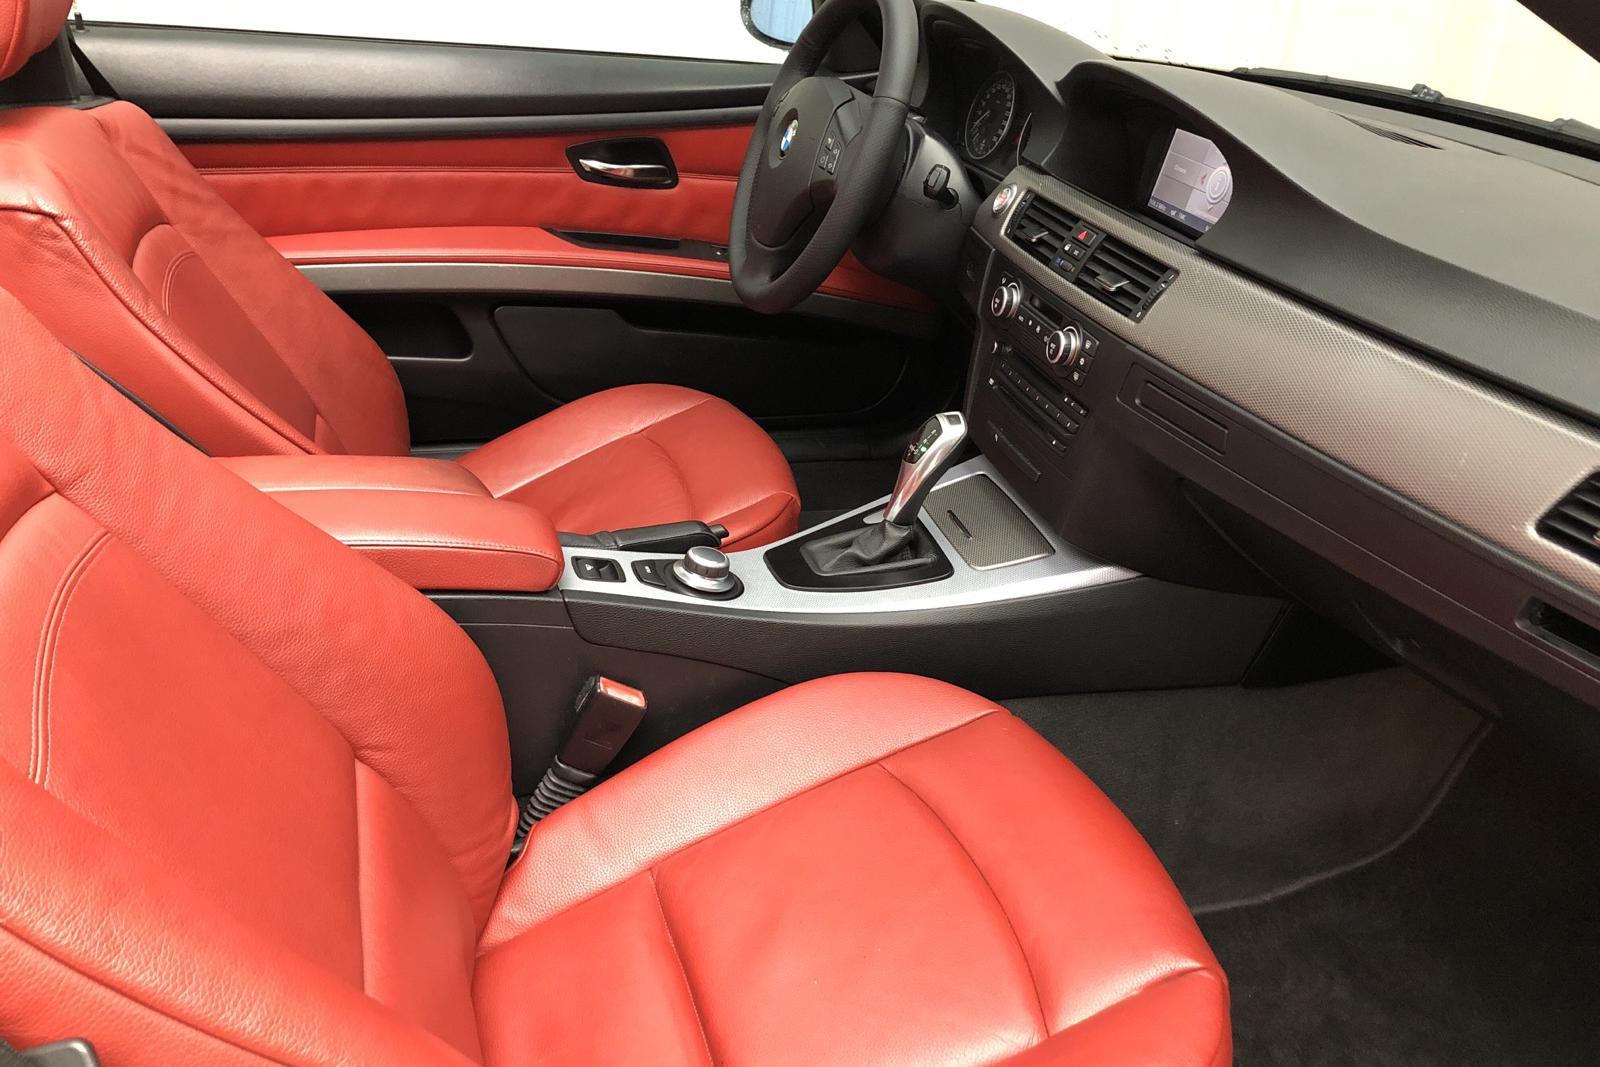 BMW 330d Cabriolet, E93 (231hk) - 150 000 km - Automatic - silver - 2007